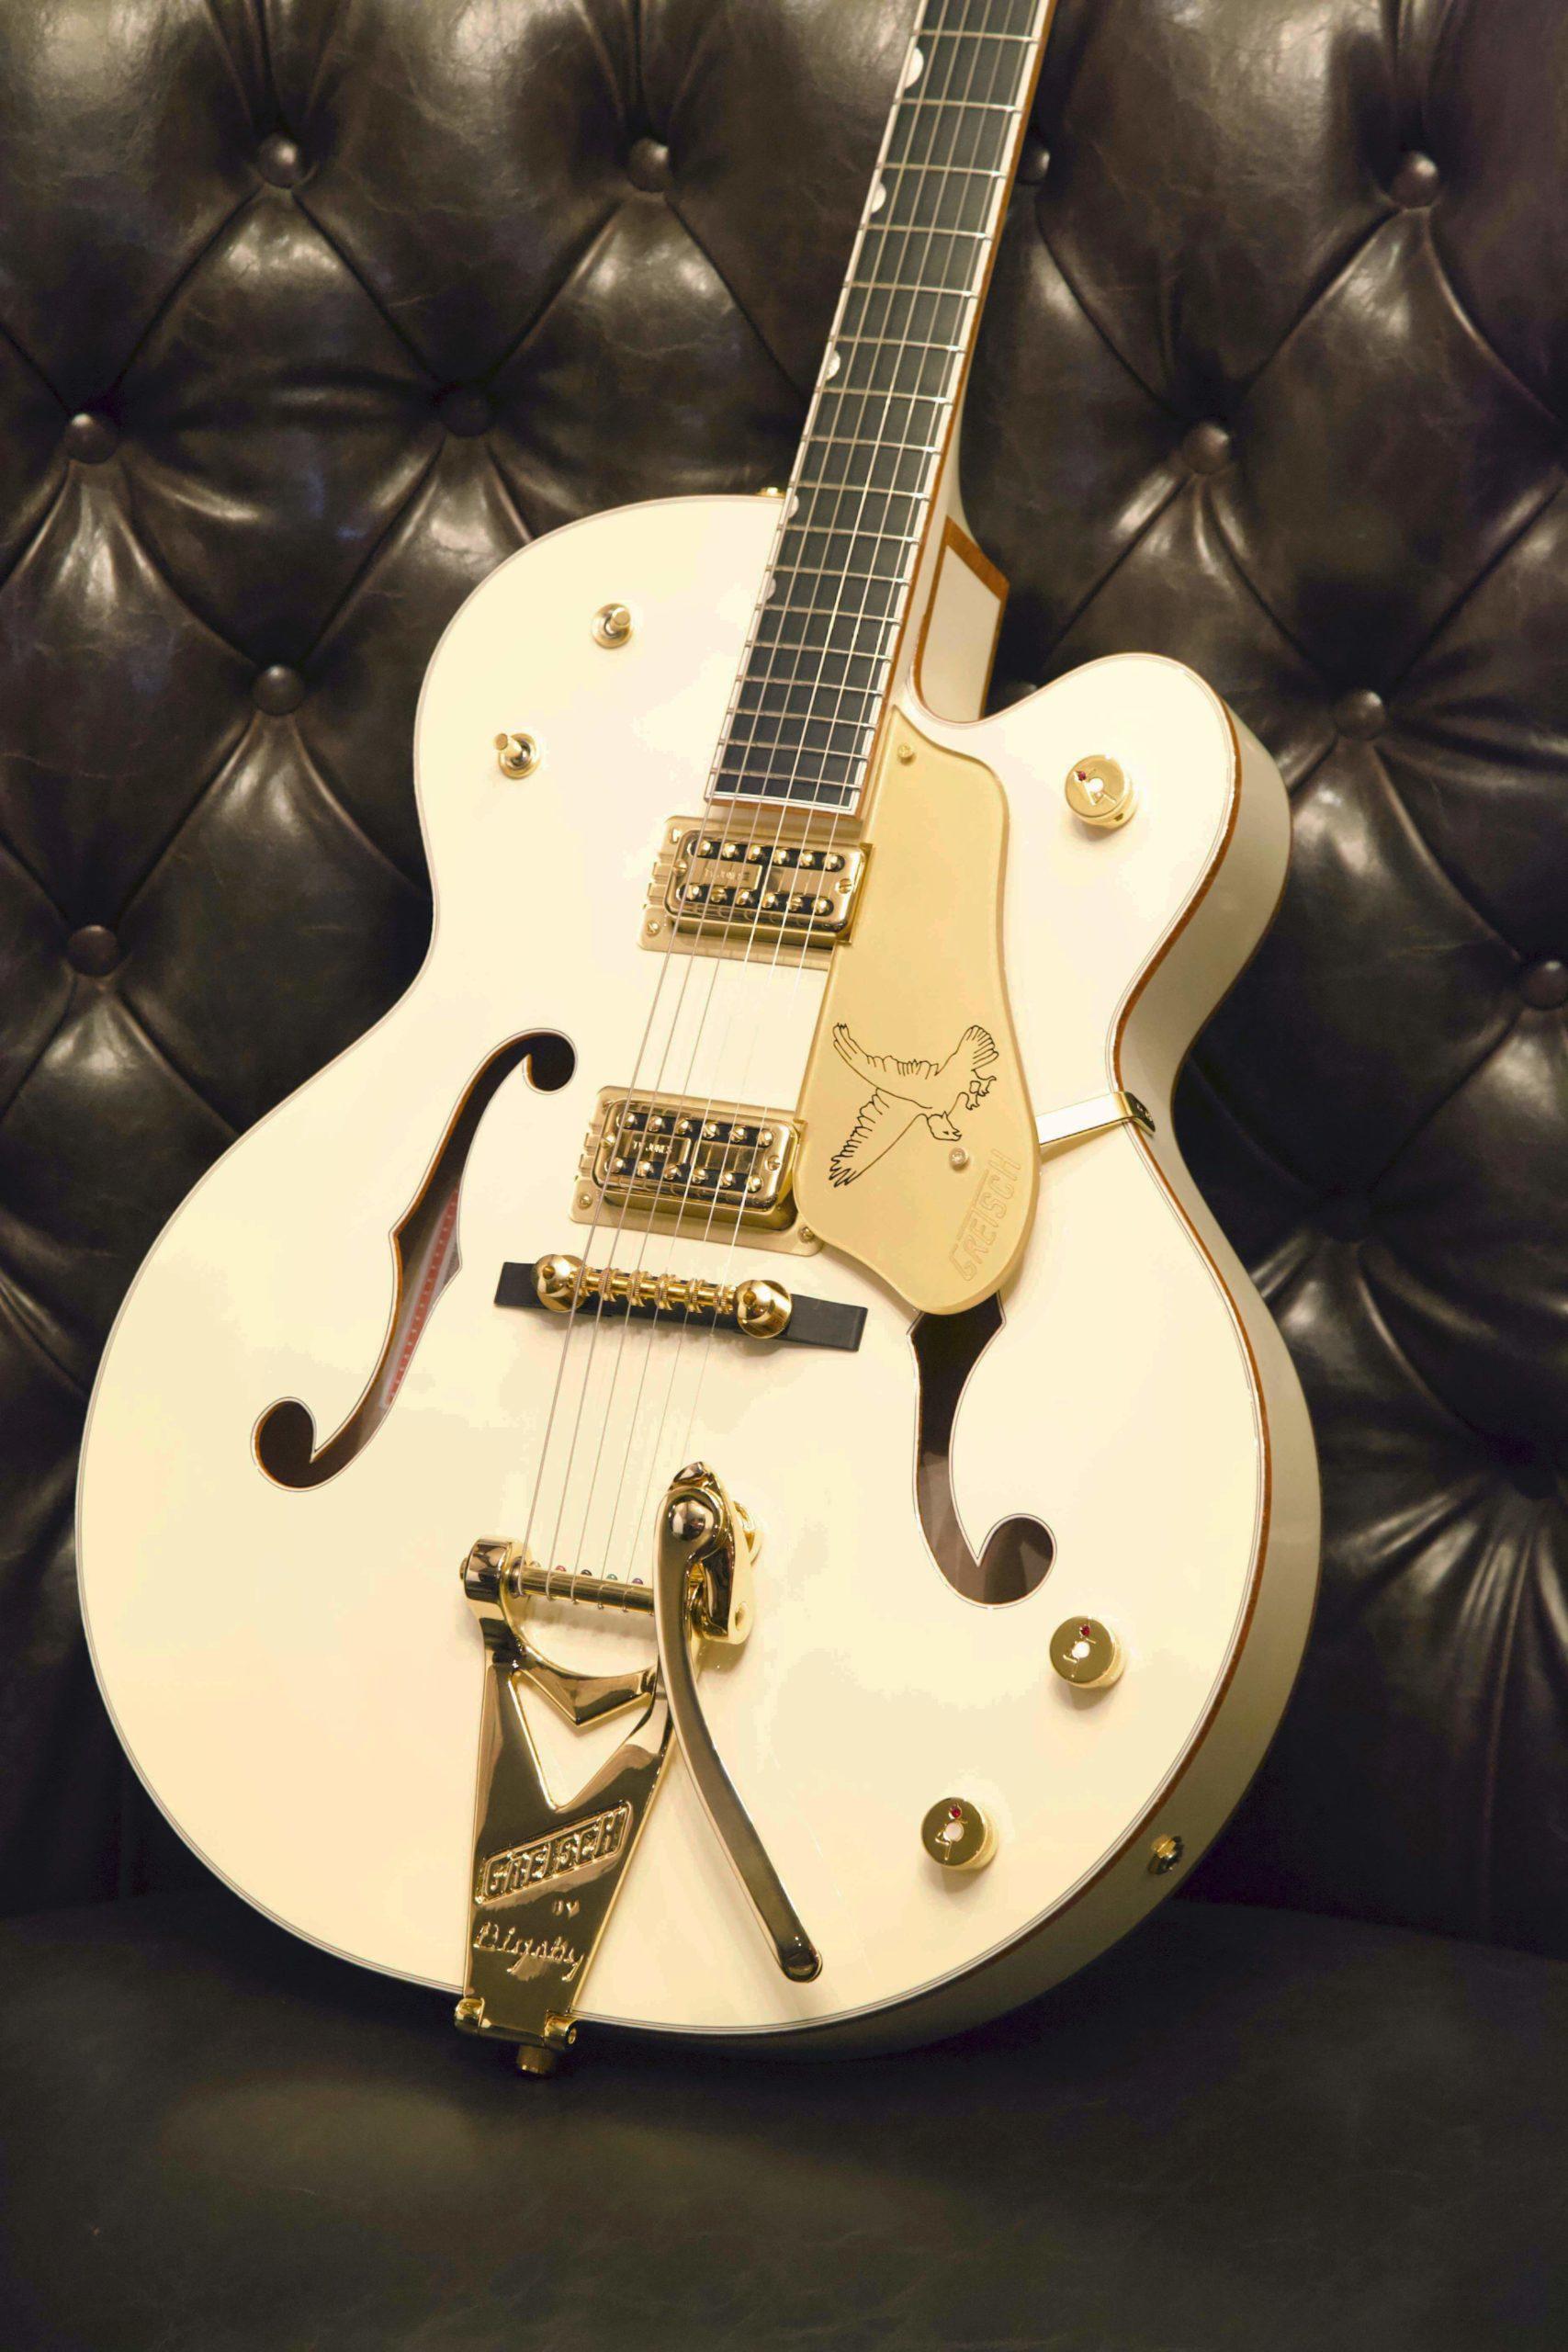 KT Tunstall Talks Gear on 'Guitar Nerds' Podcast